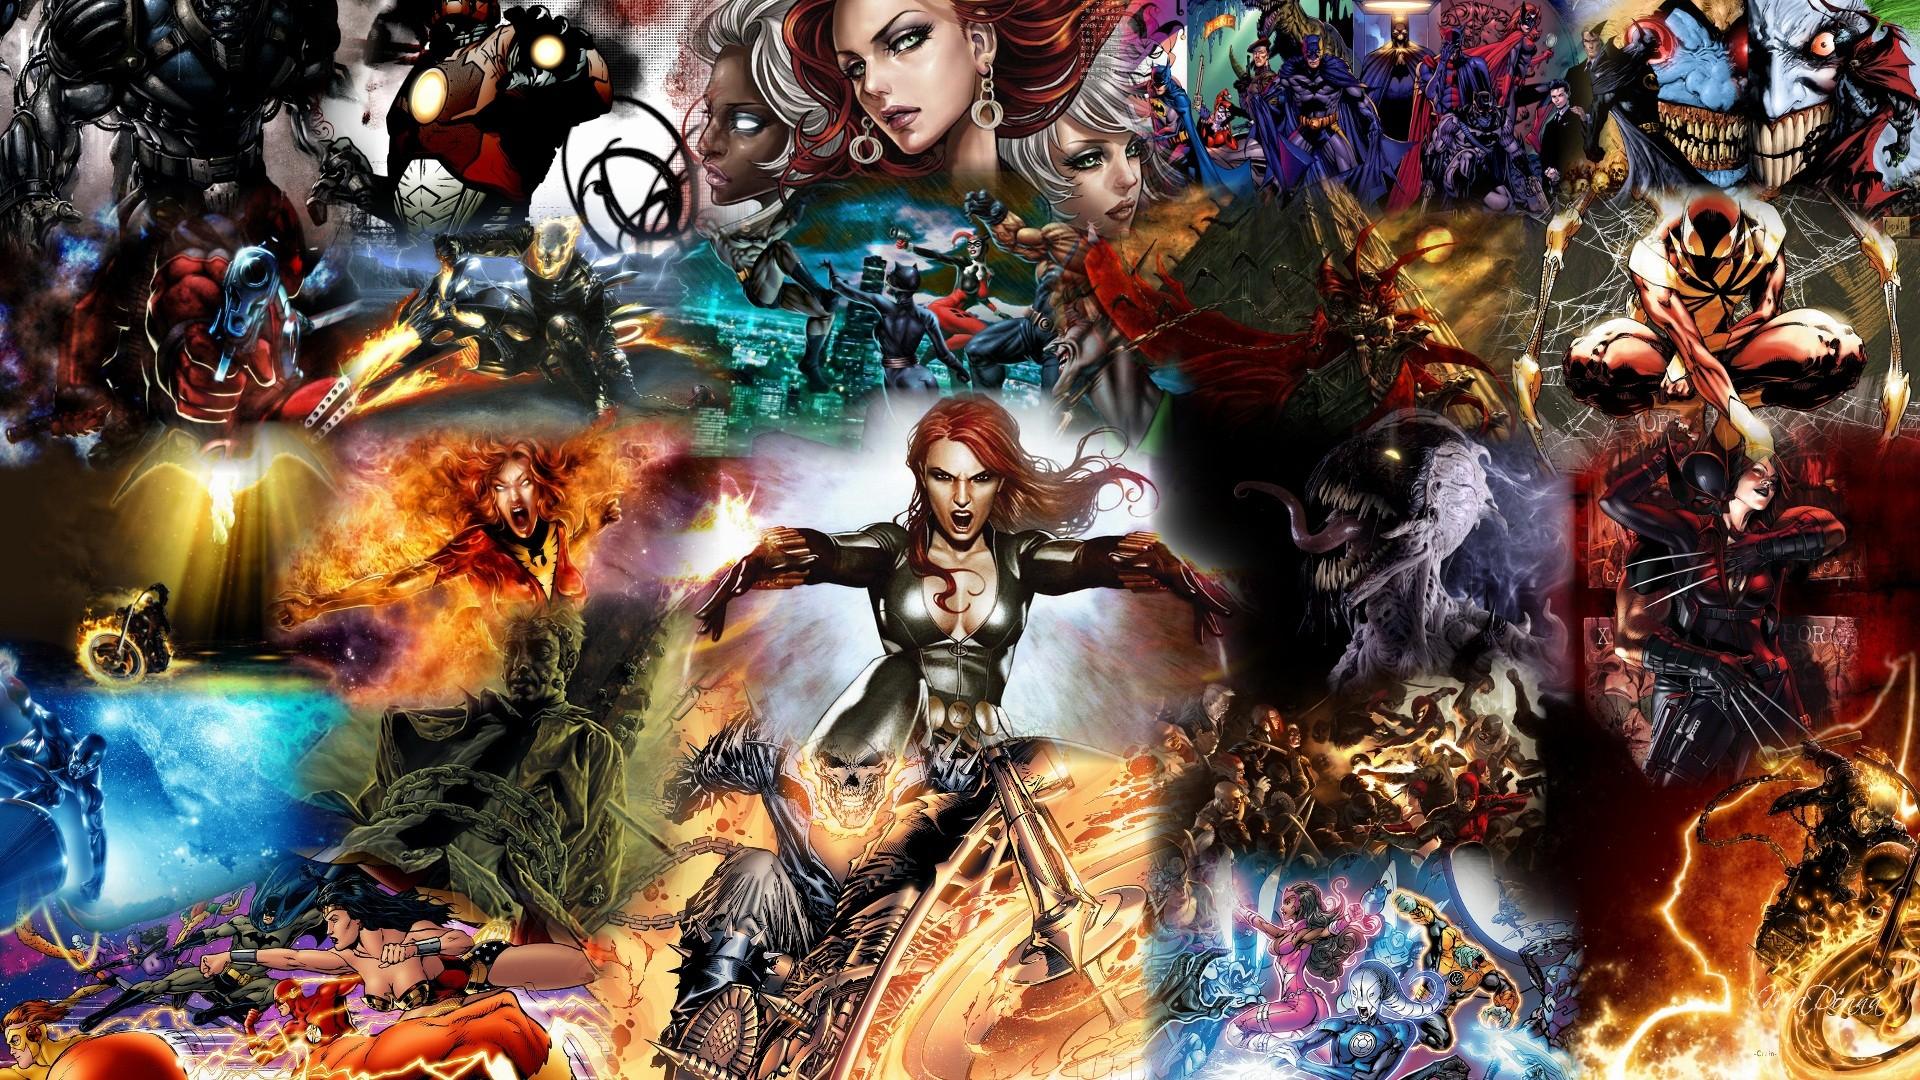 Ghost Rider Bike Hd Wallpaper Hd Comic Book Desktop Backgrounds Pixelstalk Net